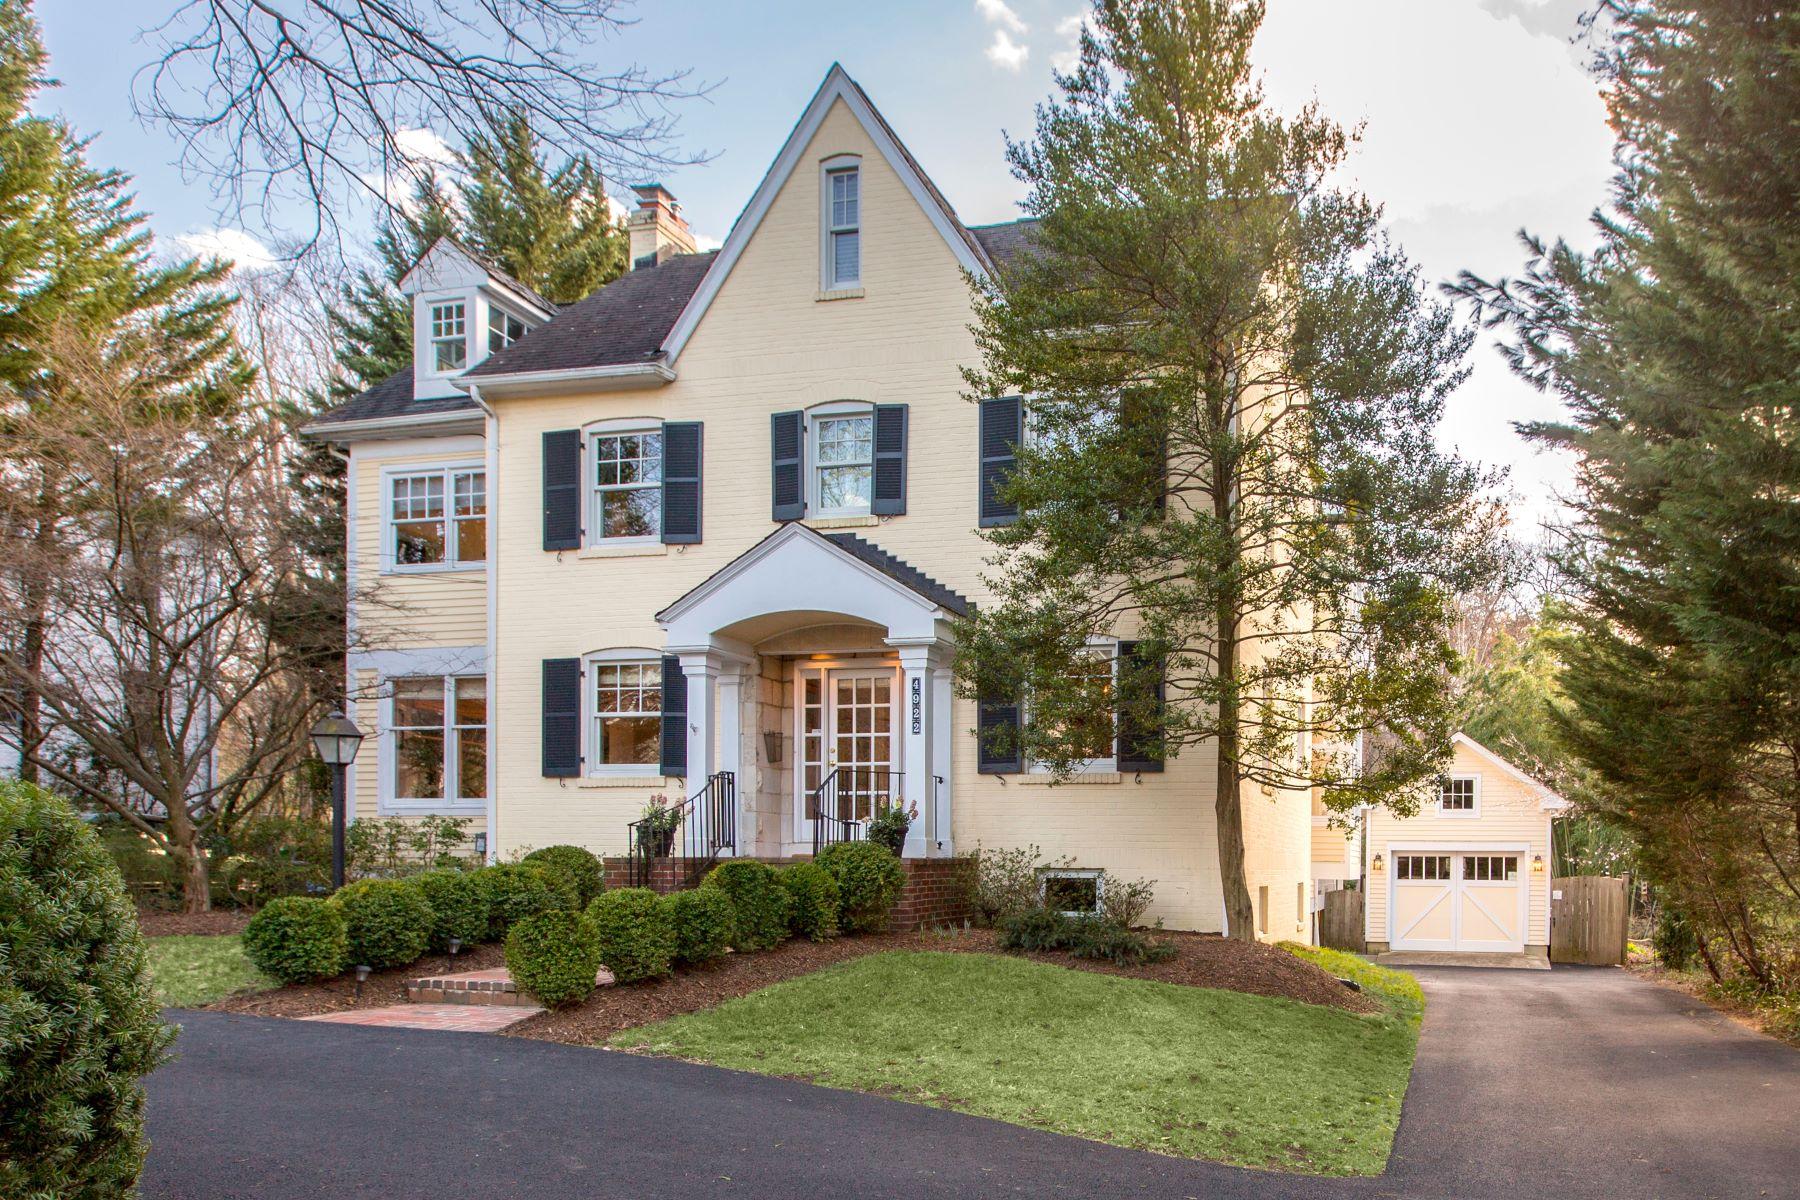 獨棟家庭住宅 為 出售 在 4922 Dorset Avenue, Chevy Chase Chevy Chase, 馬里蘭州, 20815 美國